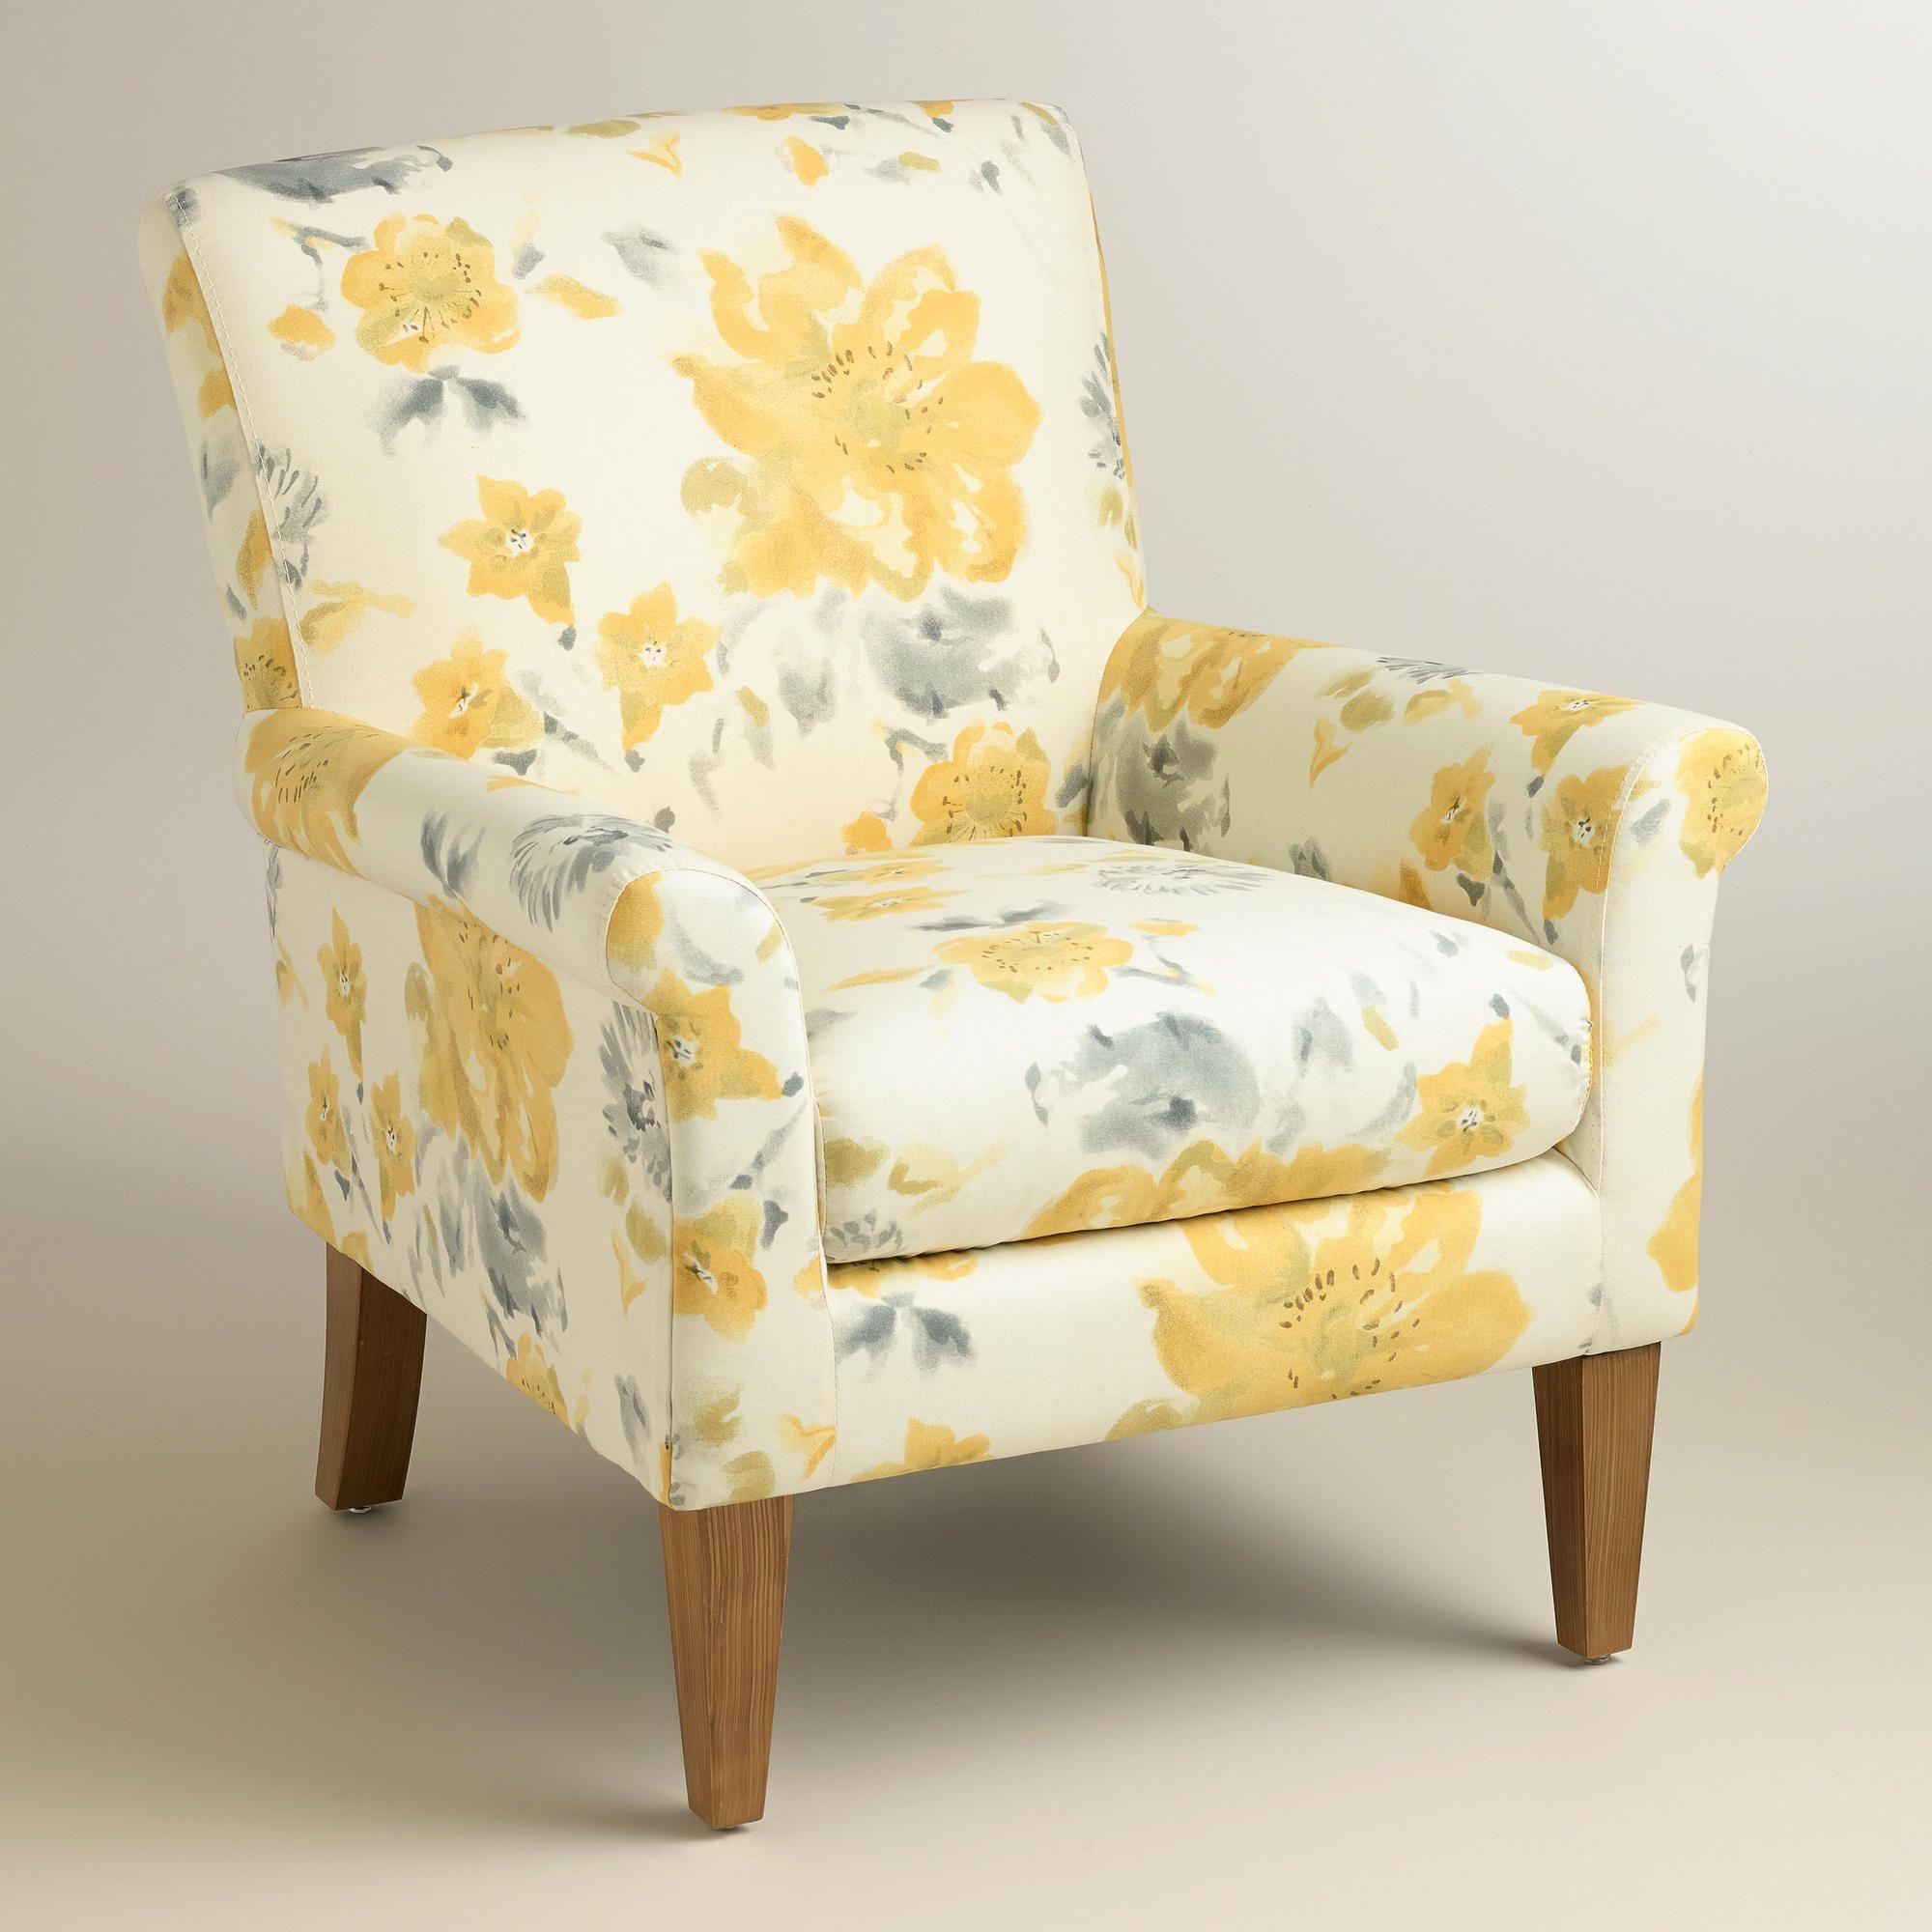 Yellow Fleurs Estelle Chair | World Market $250 $180 if same sale ...